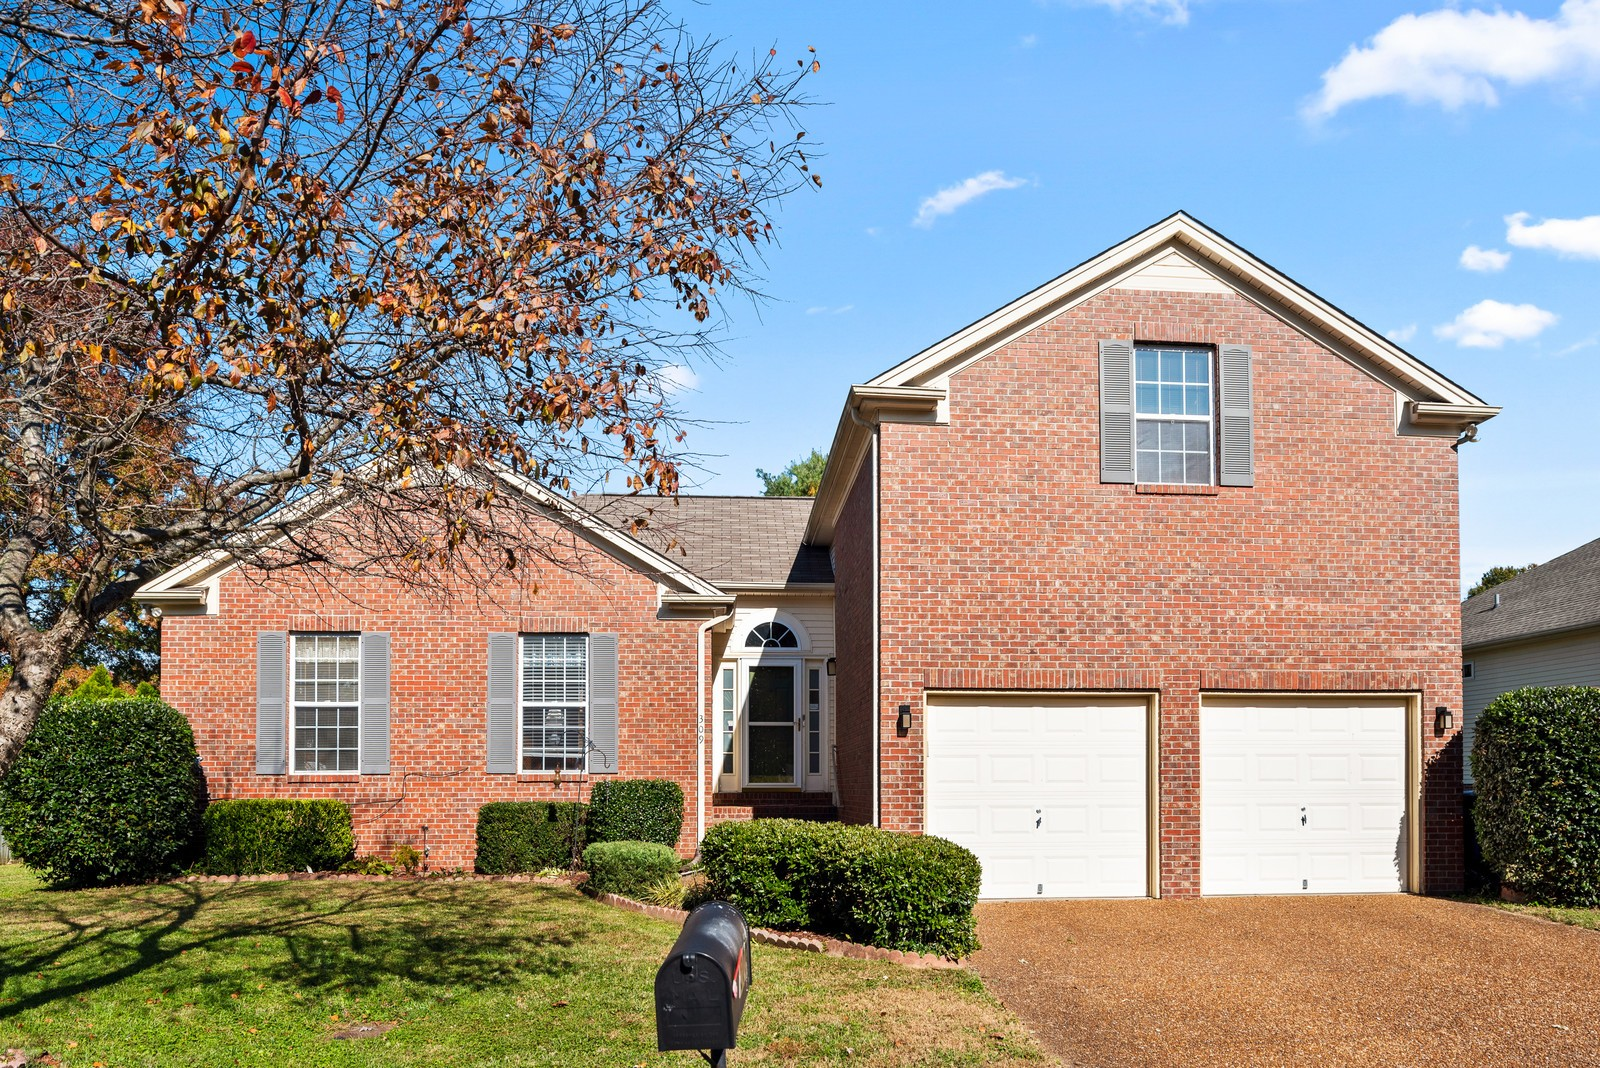 309 Jayme Mika Ct, Joelton, TN 37080 - Joelton, TN real estate listing